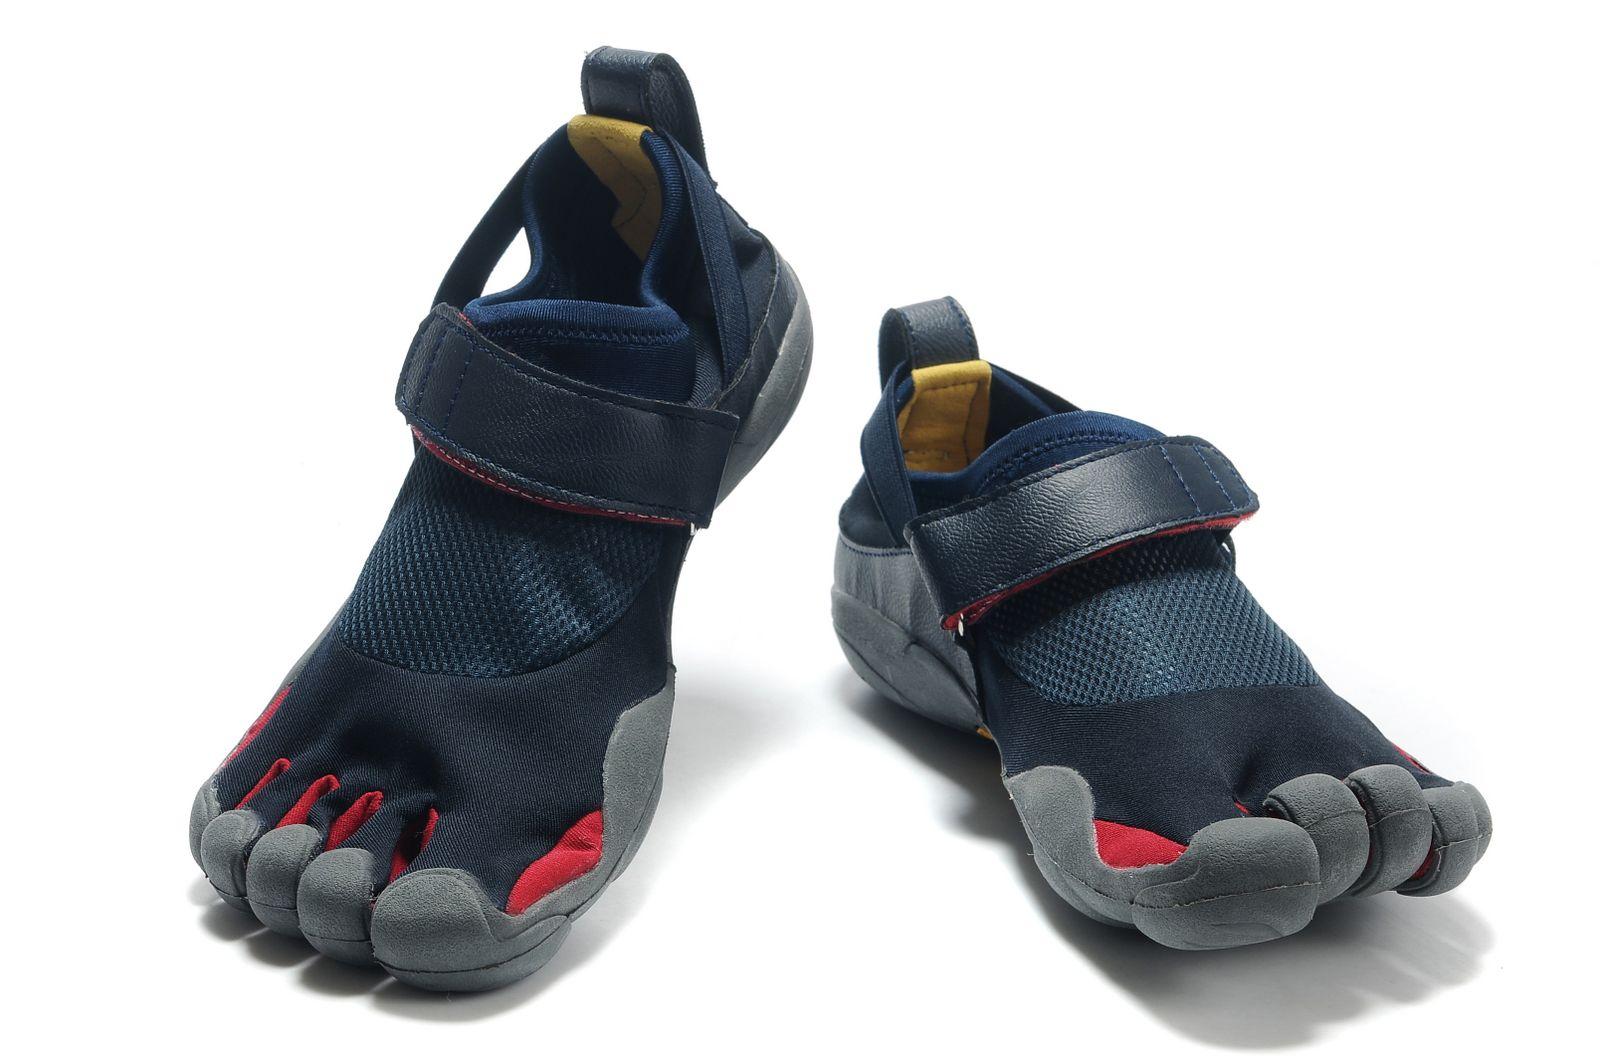 Nike Five Toe Shoes